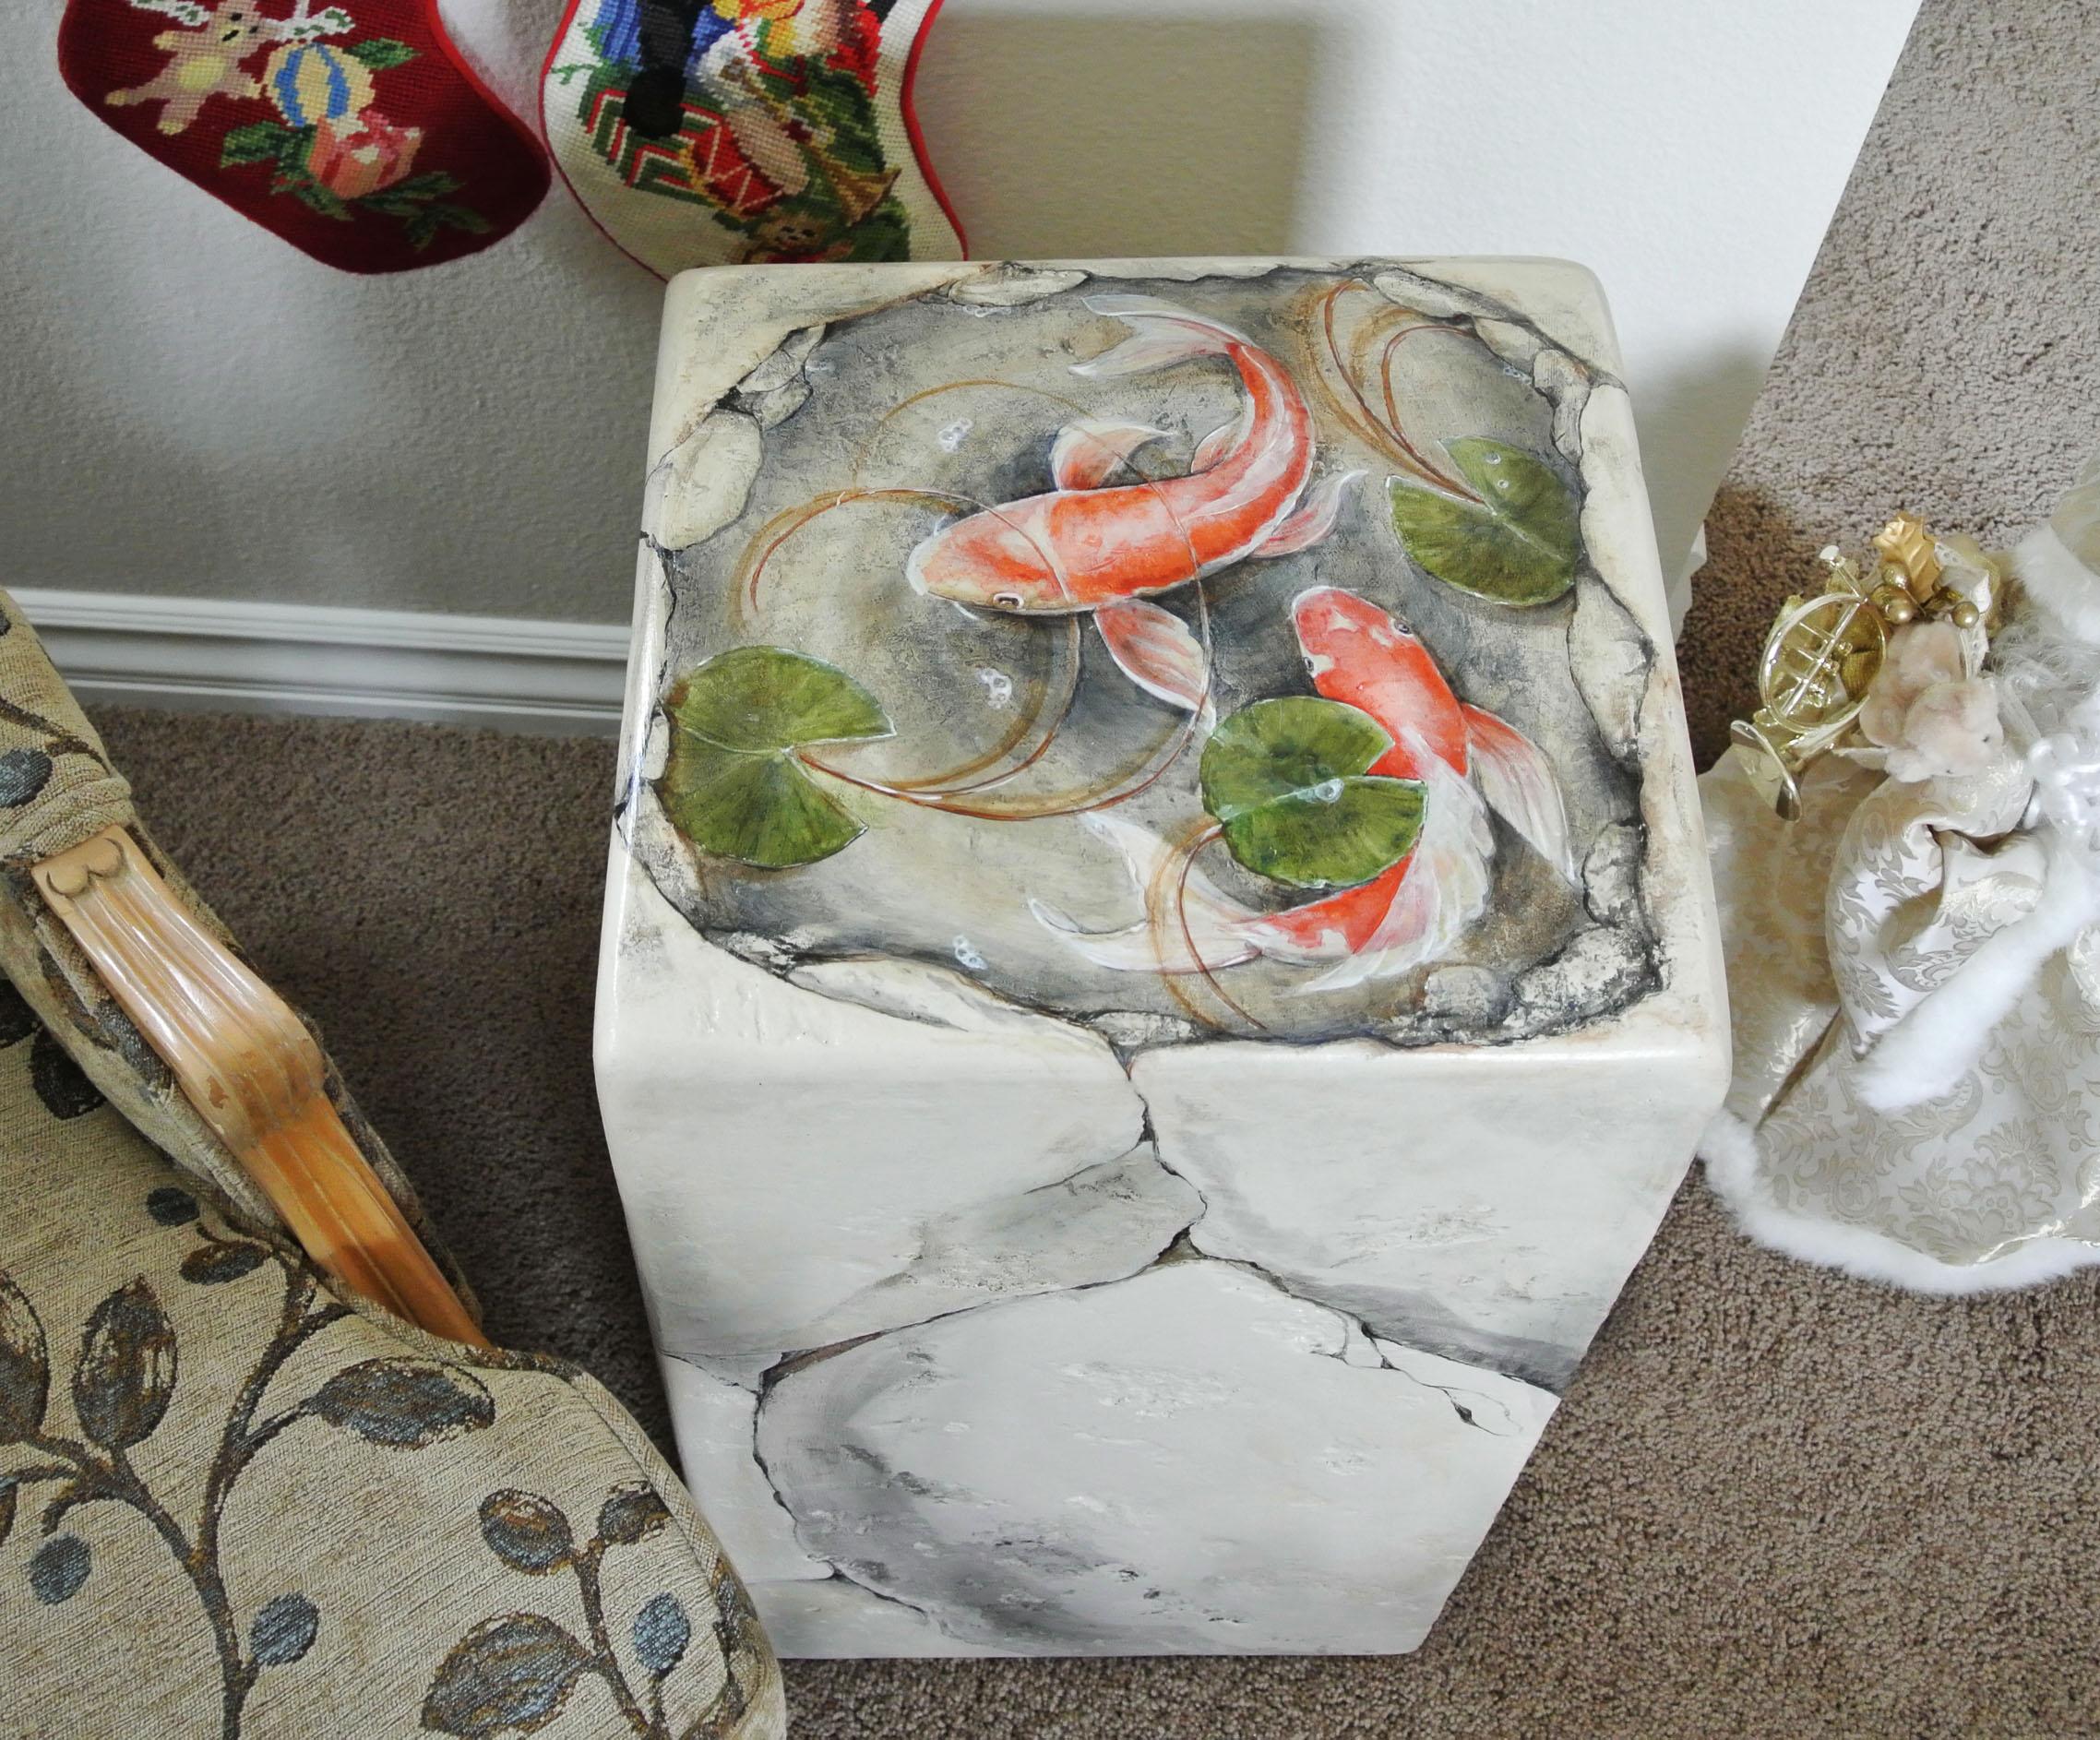 Decorative table koi pond hand painted decor sugarmanart for Pond decorative accessories